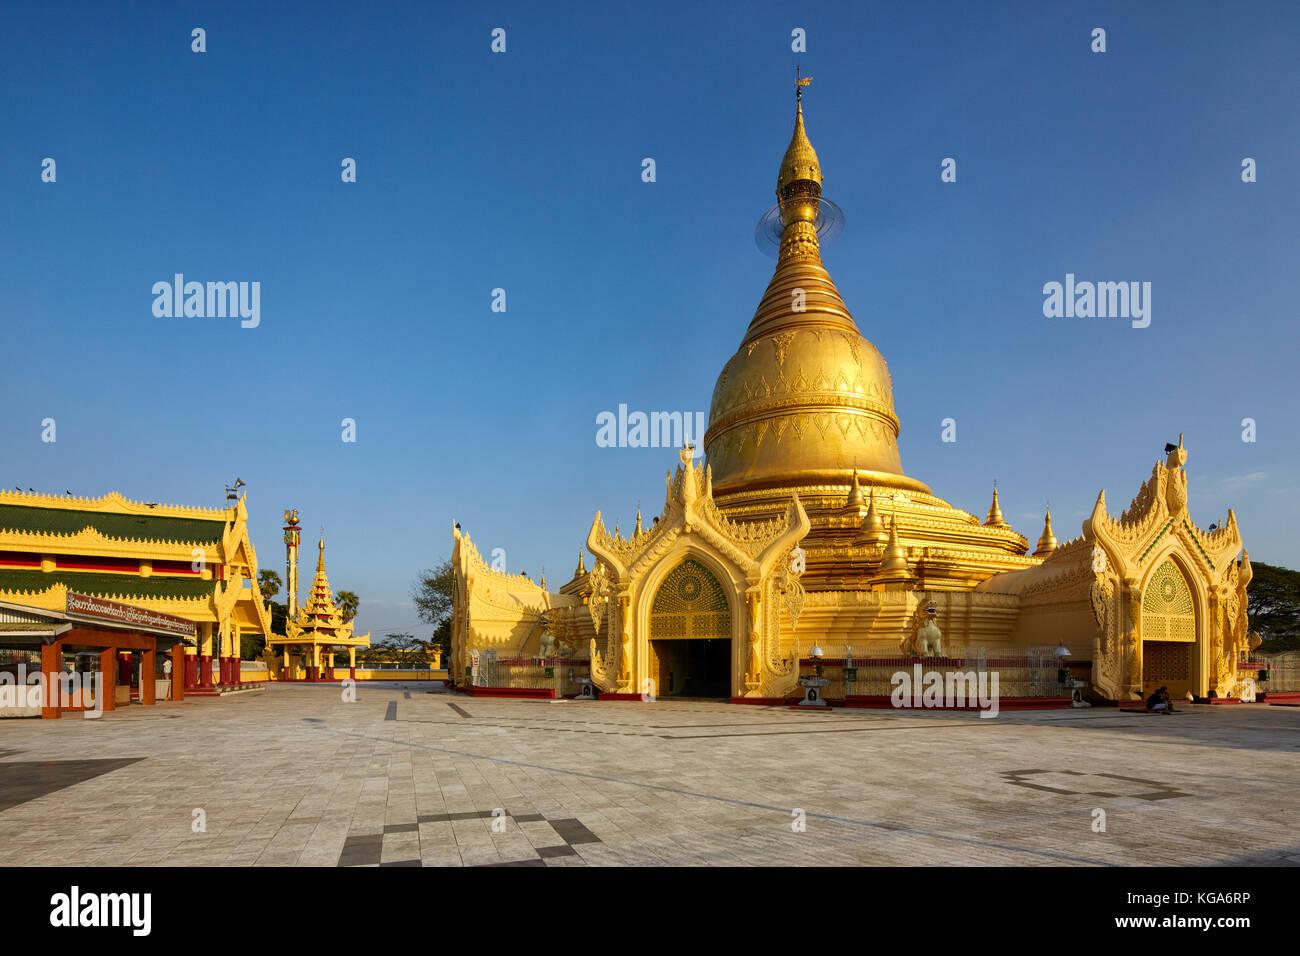 Maha Wizaya Pagoda, Yangon, Myanmar (Burma), Southeast Asia Stock Photo